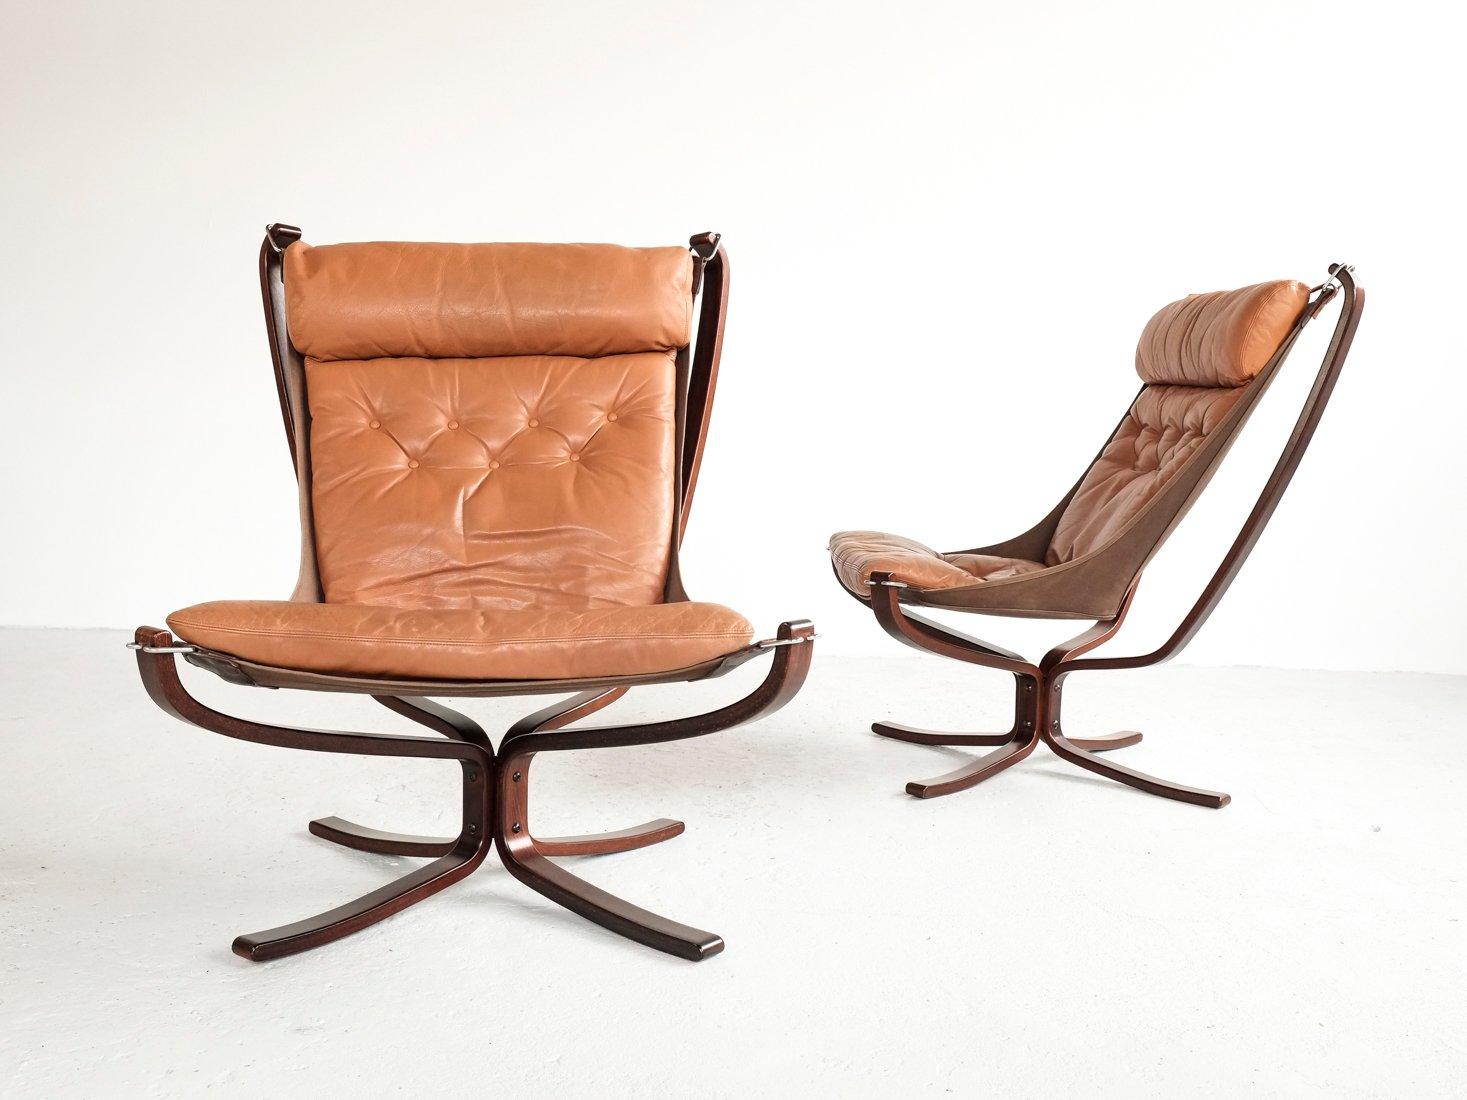 falcon sessel mit hoher r ckenlehne von sigurd resell f r. Black Bedroom Furniture Sets. Home Design Ideas